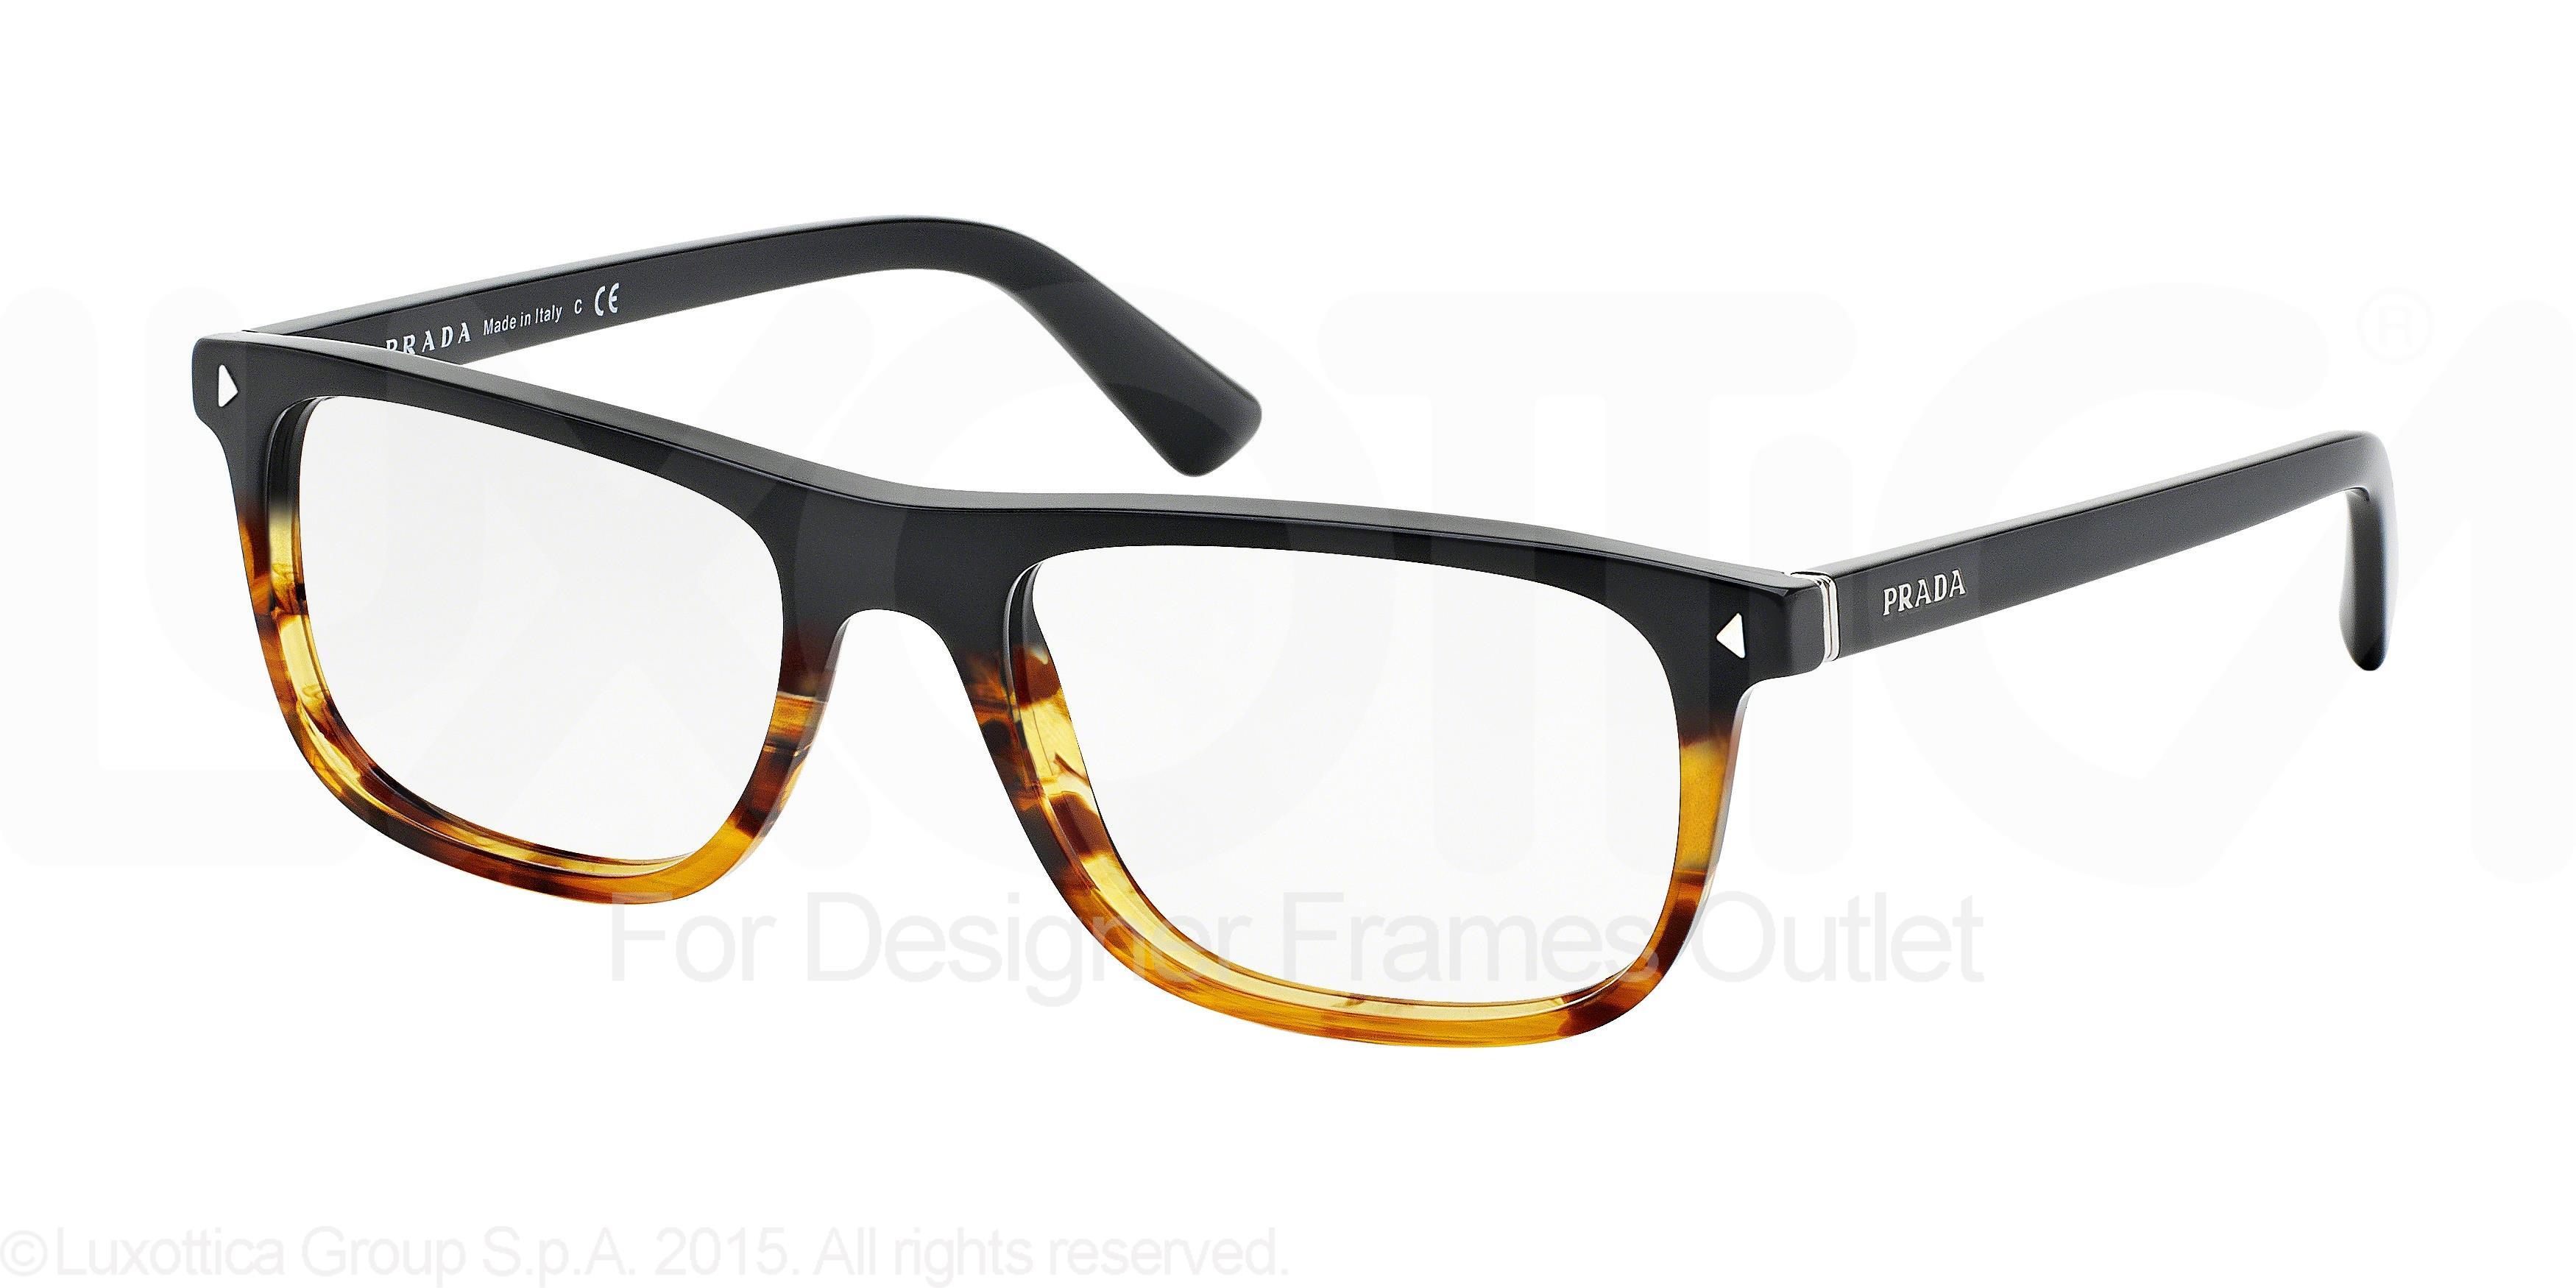 6f91f75eb401 Designer Frames Outlet. Prada PR03RV